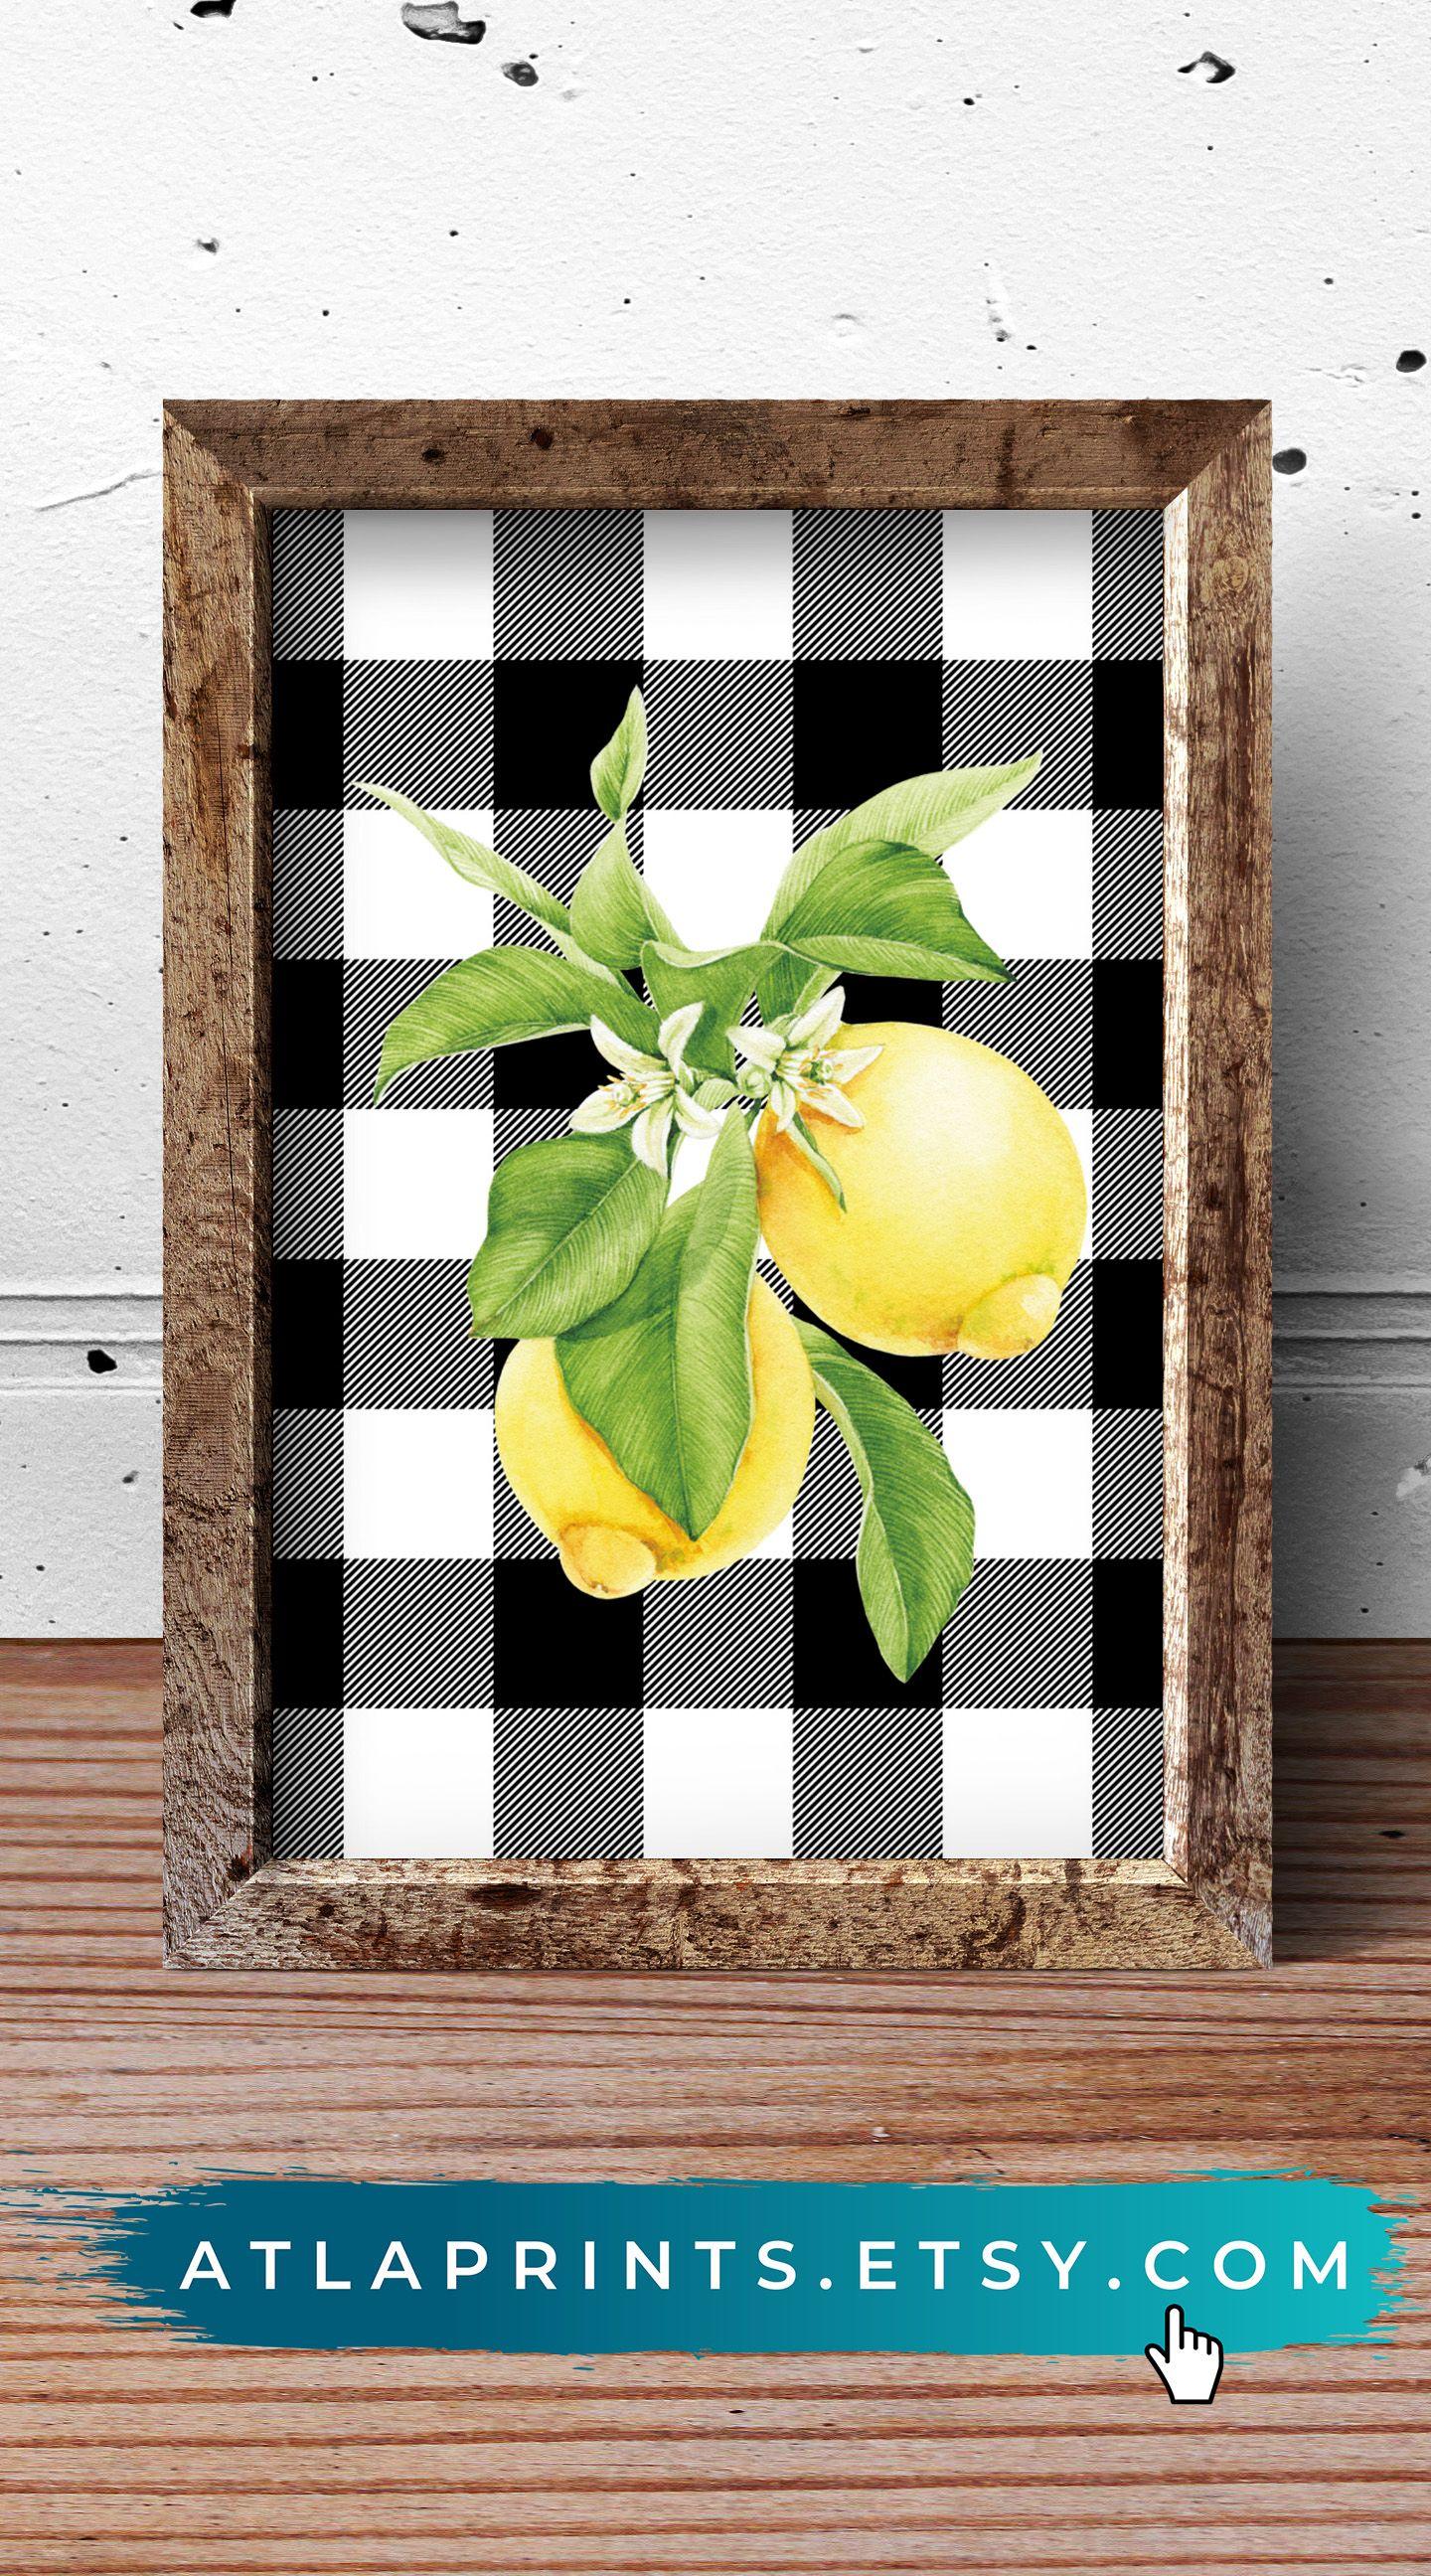 Buffalo Check Wall Art Lemon Decor Lemon Kitchen Decor Sunflower Kitchen Decor